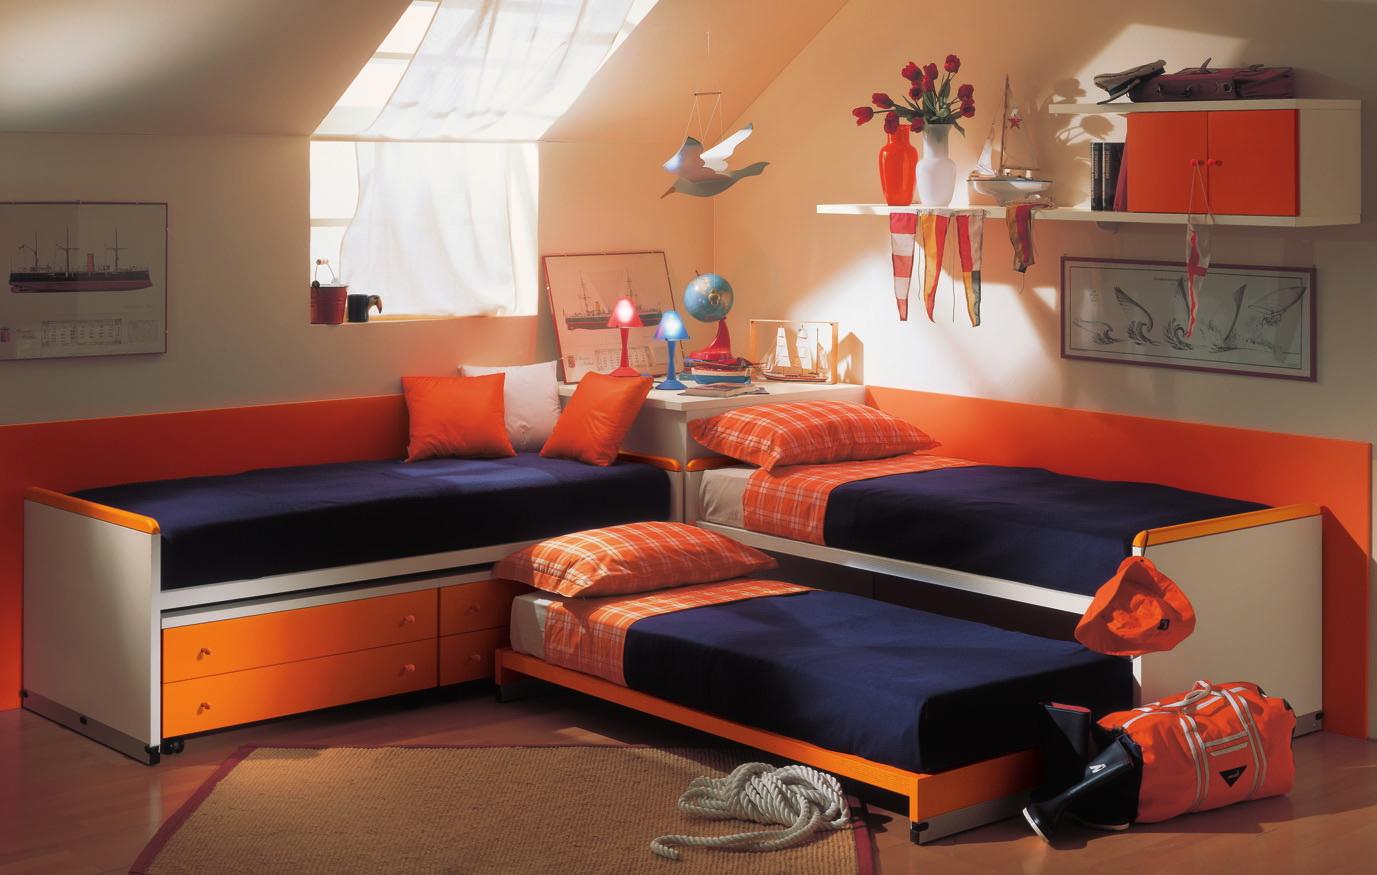 Orange mates beds bedroom decoration interior design ideas - Orange bedroom interior design ...